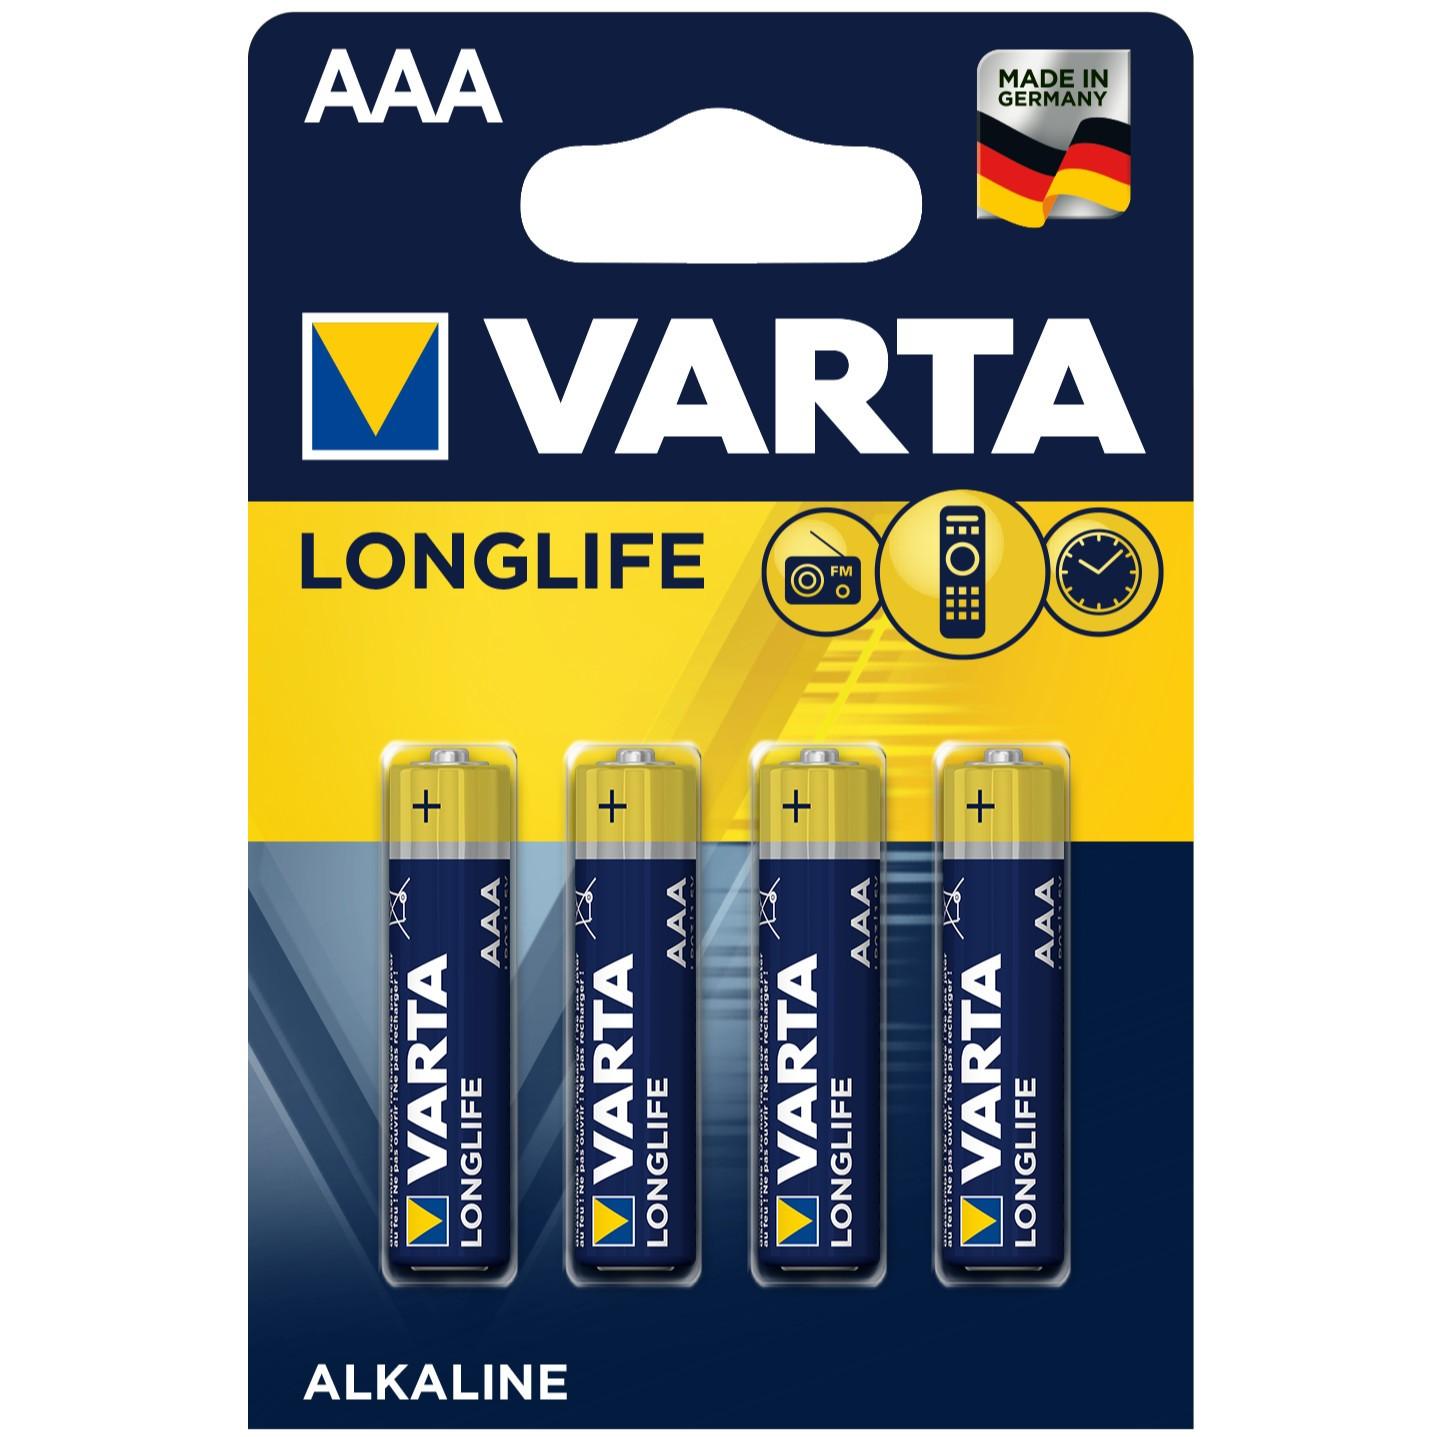 Baterie Varta Longlife Extra 4103, R3 / AAA, Alkaline, 4 buc